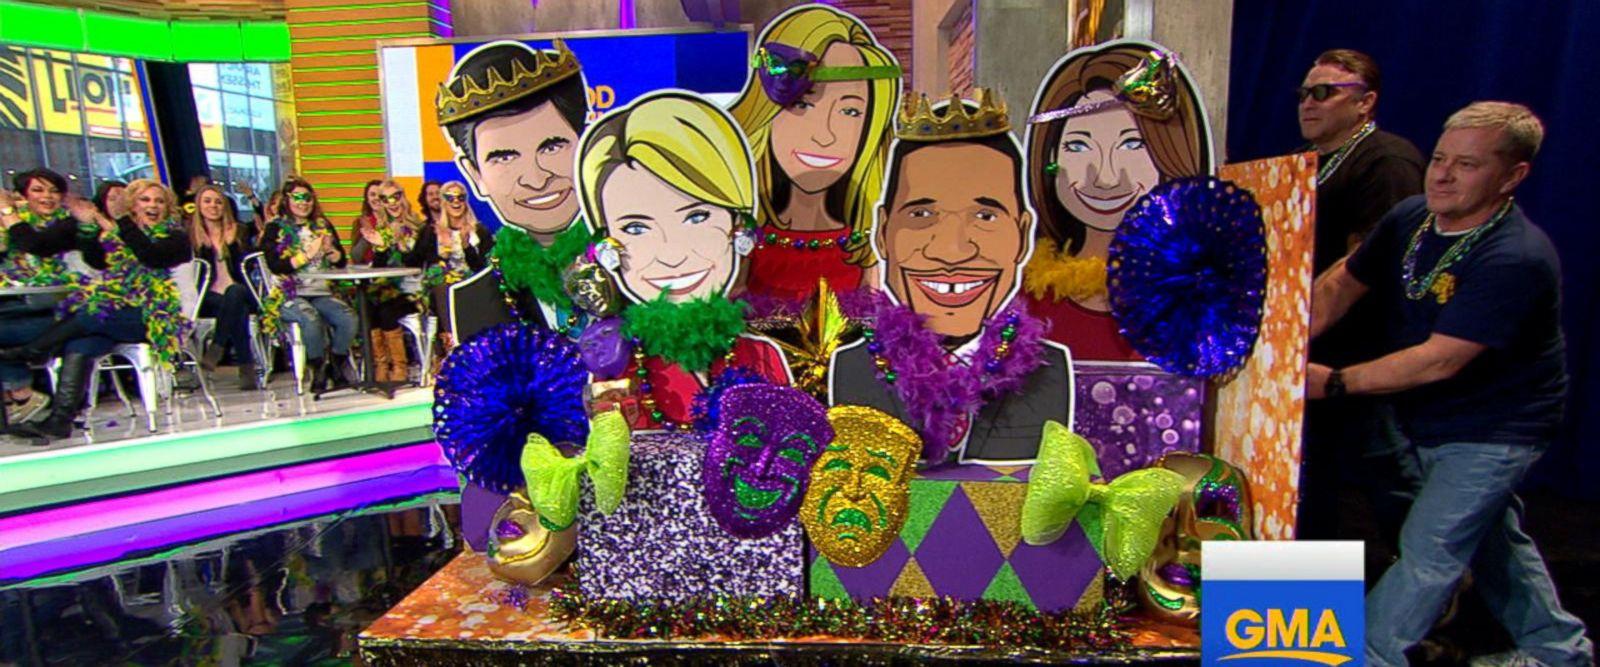 VIDEO: Robin Roberts brings Mardi Gras spirit to 'GMA'